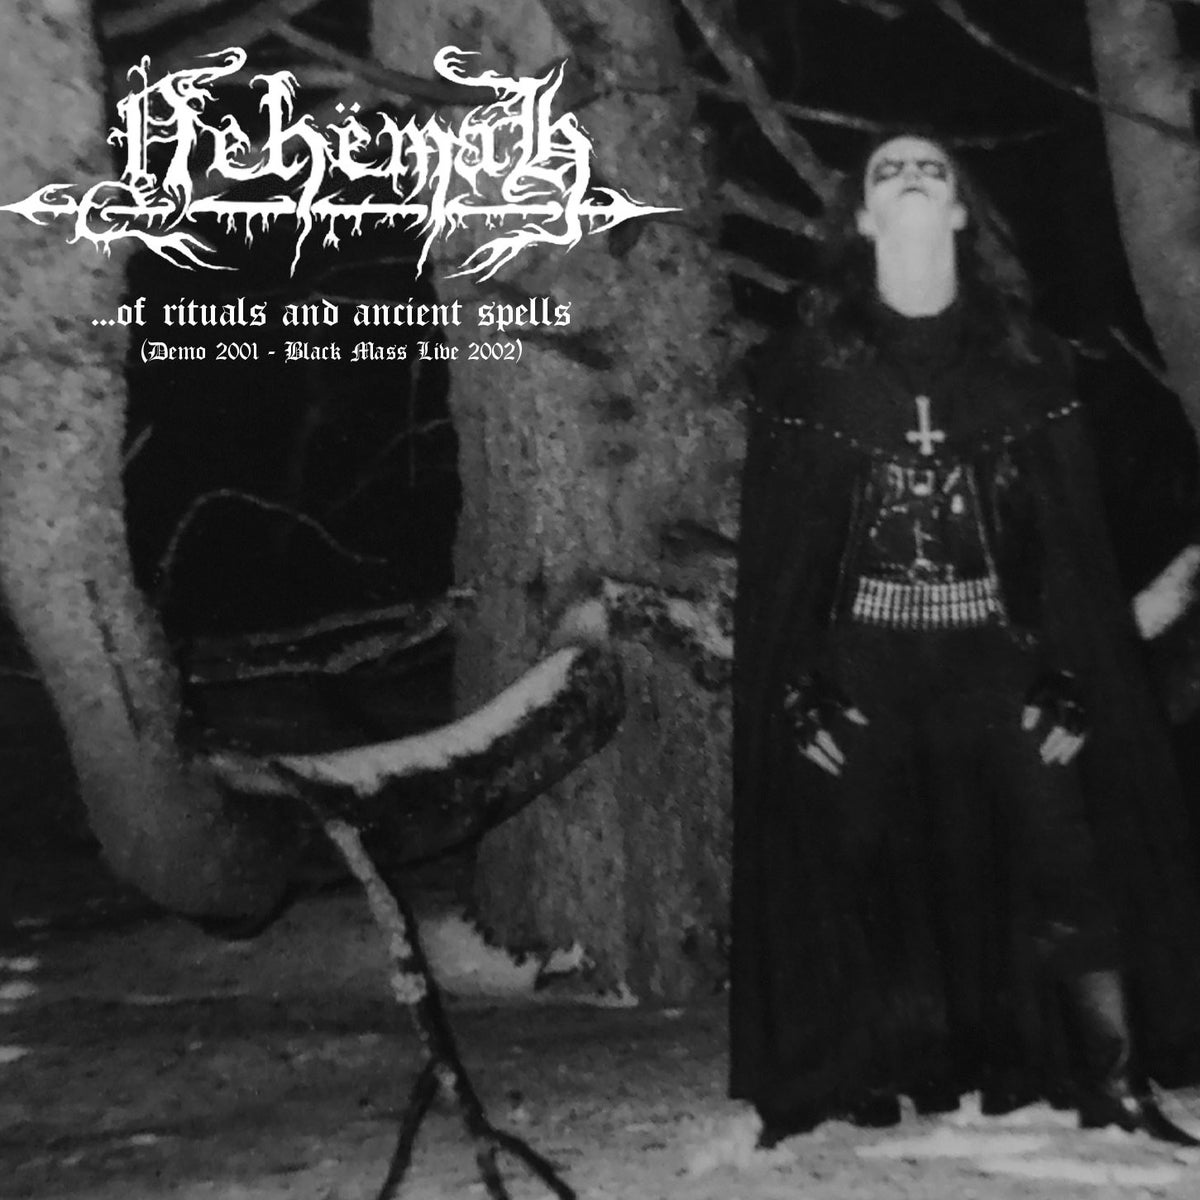 NEHEMAH -...OF RITUALS AND ANCIENT SPELLS (DEMO 2001 - BLACK MASS LIVE 2002)- DIGI-CD